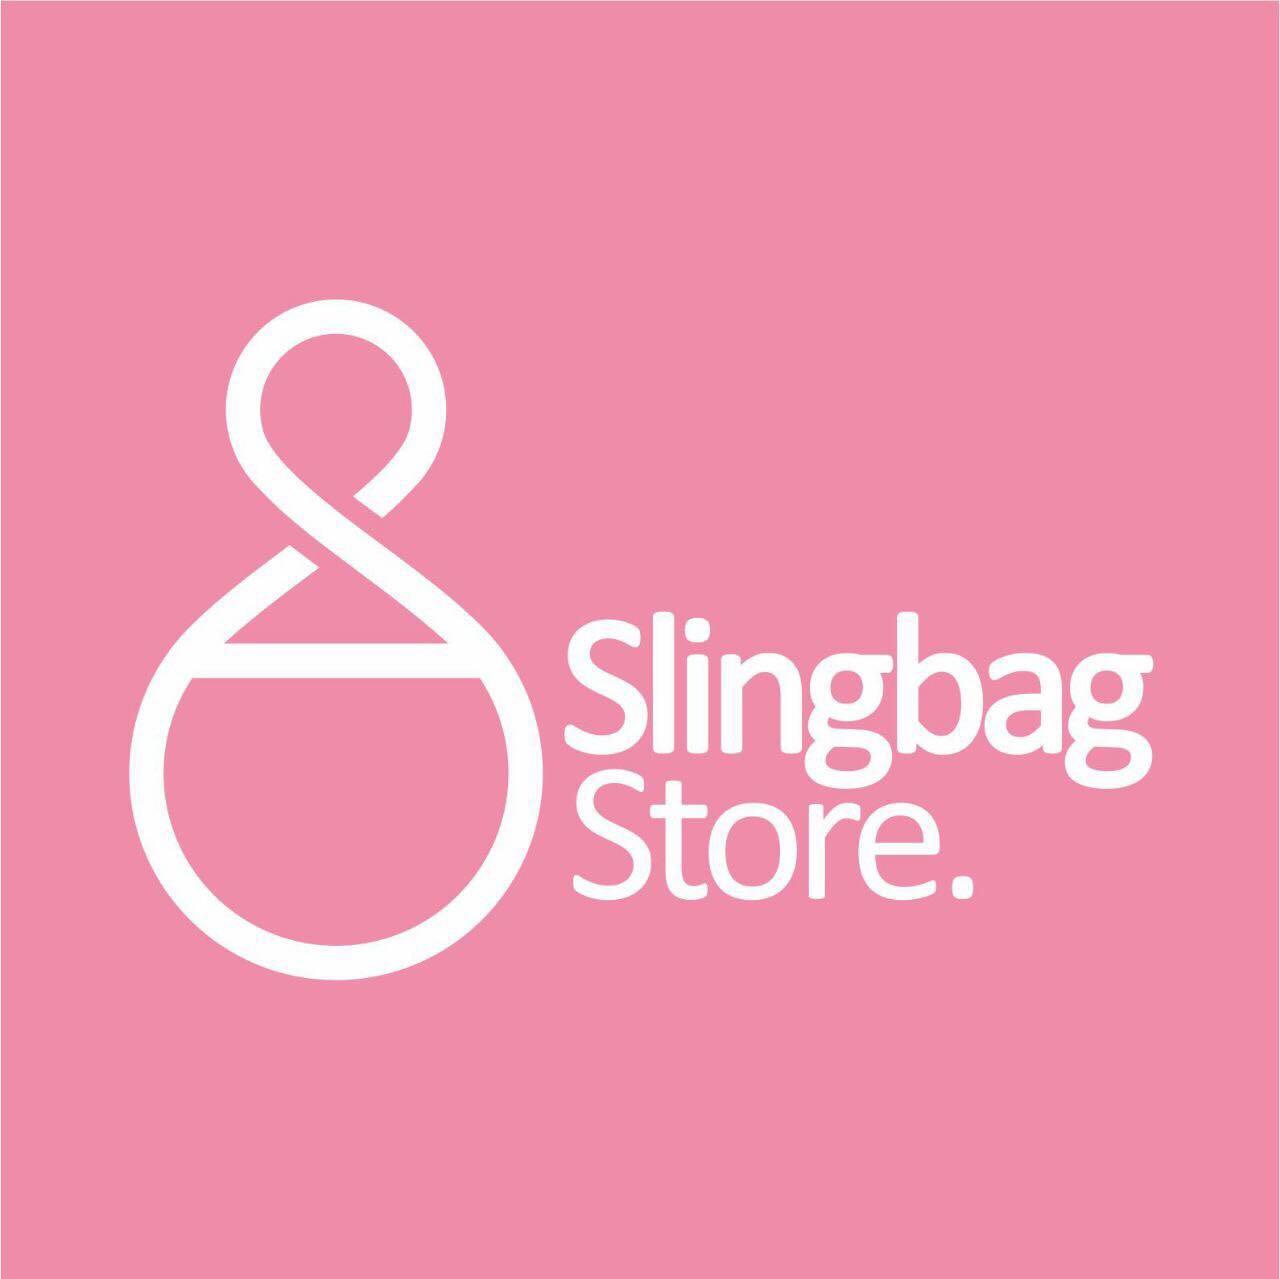 Shesa Sling Bags Store Tas Kulit 2 Fungsi Bag Backpack